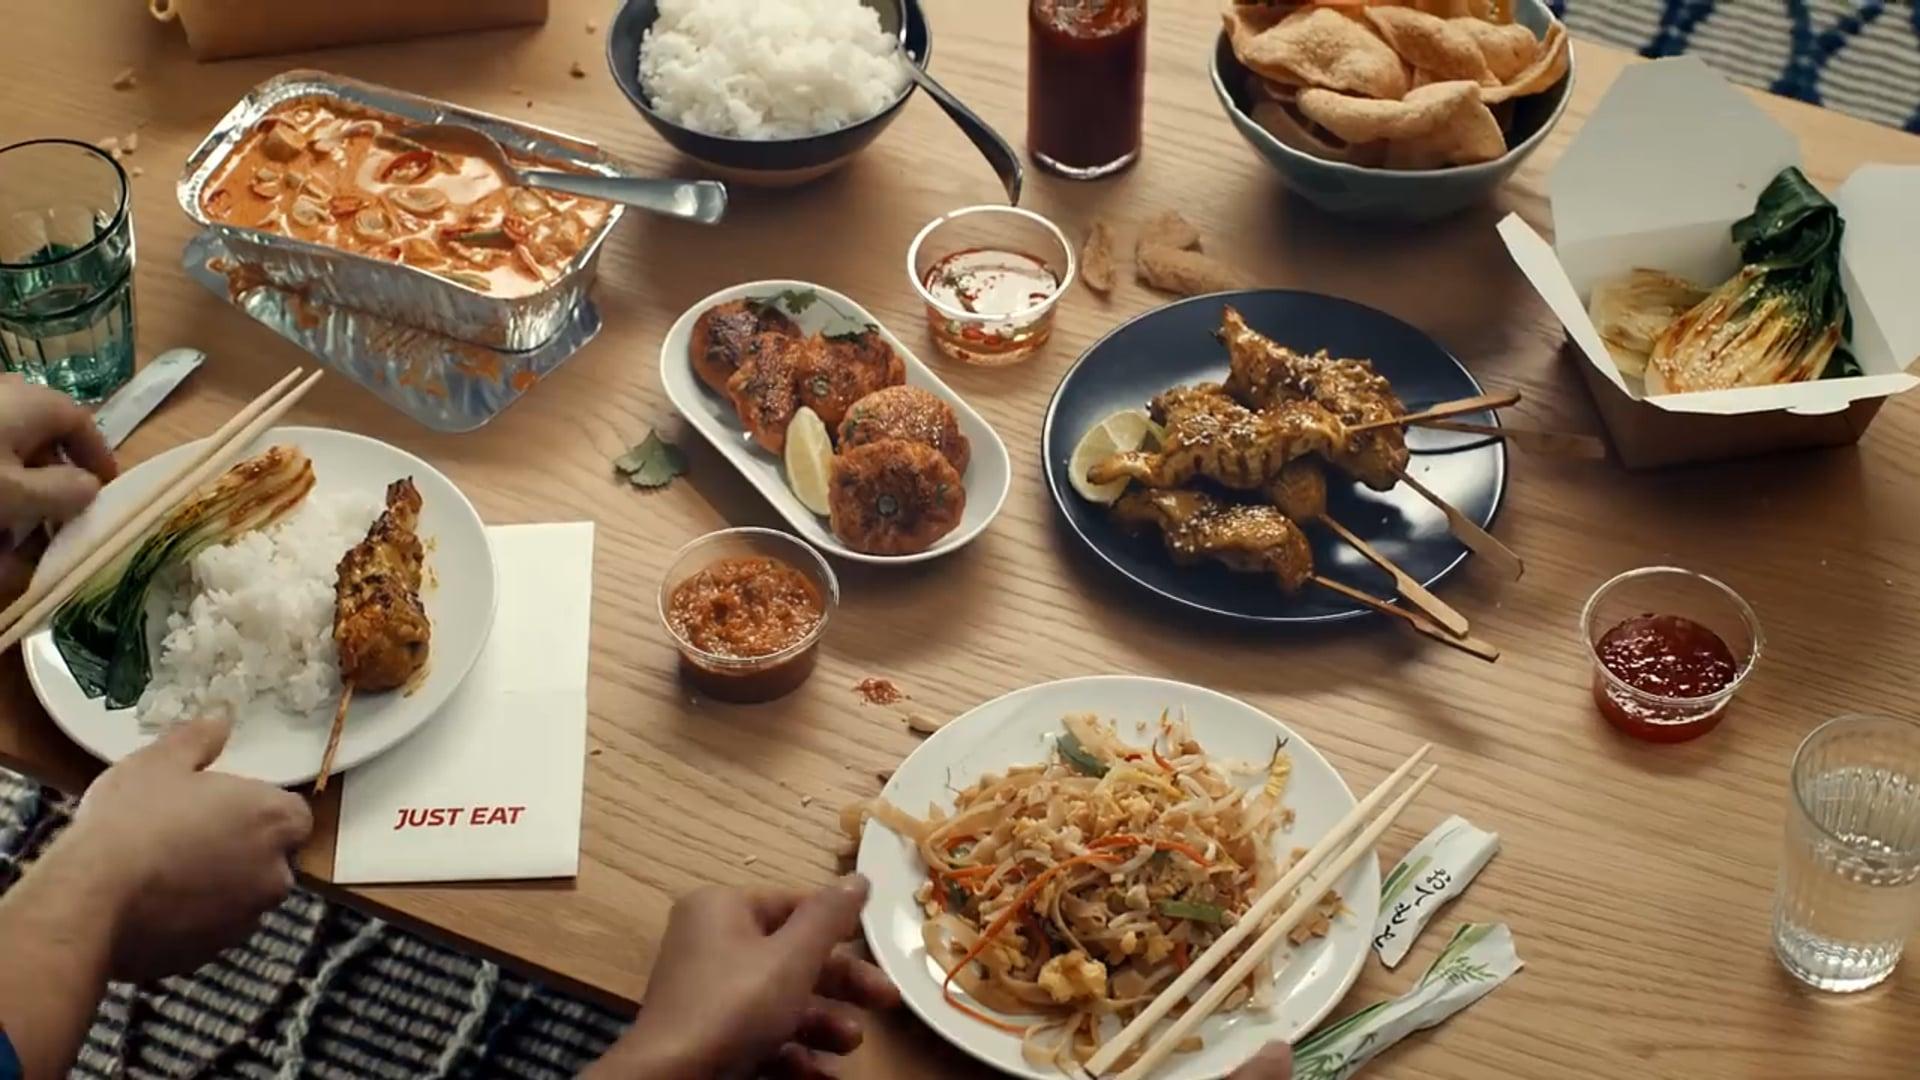 Tanya Sadourian - Just Eat 2019 advert – Did Somebody Say Just Eat